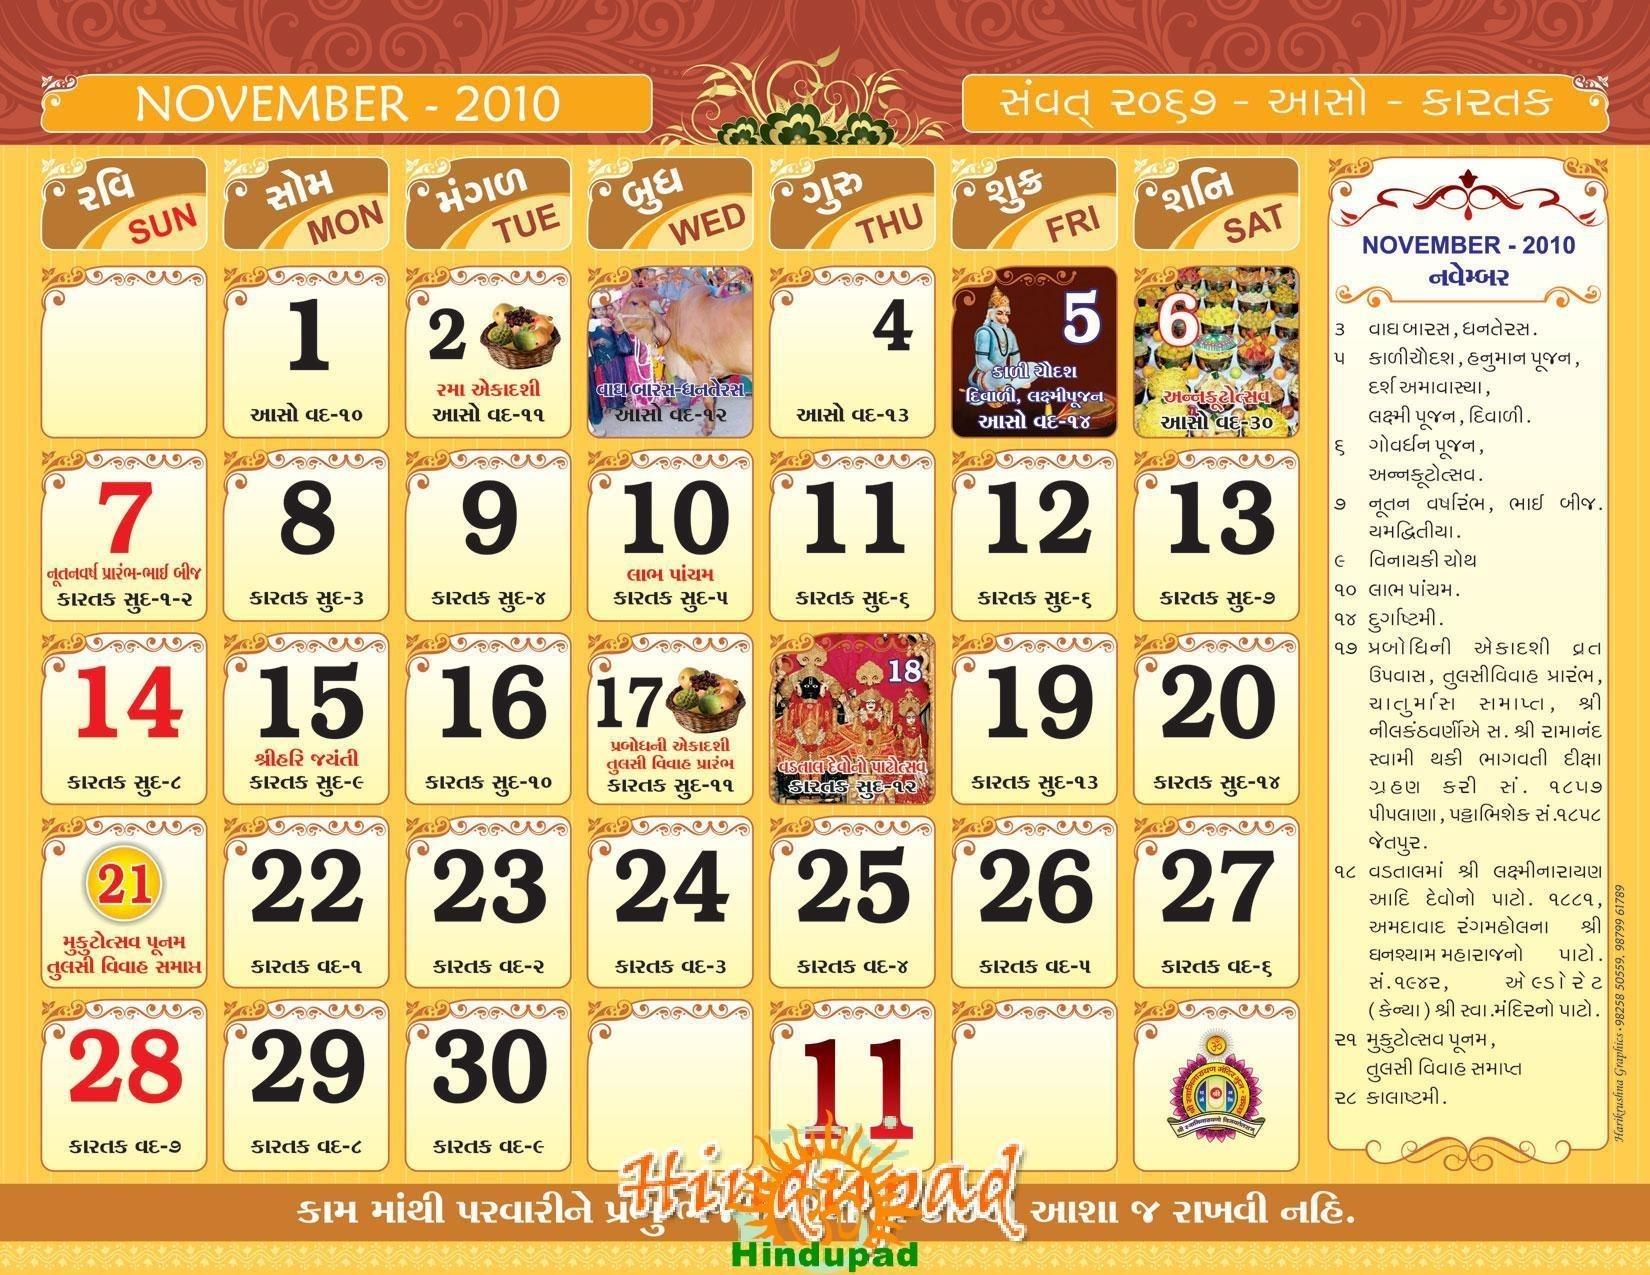 Gujarati Calendar November 2010 – Download Free Gujarati-Gujarati Calendar 2020 January